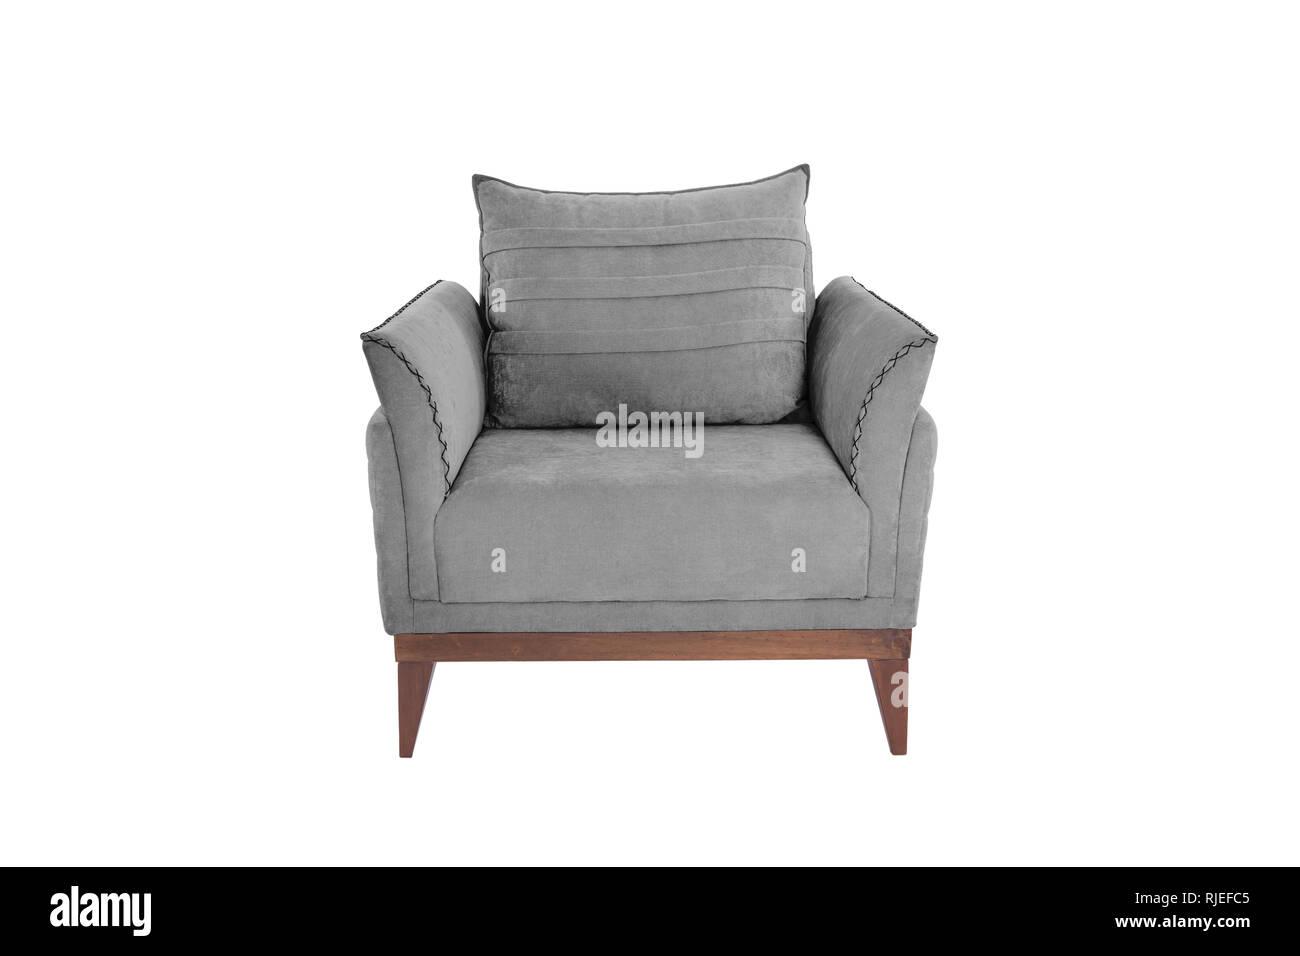 armchair modern designer chair on white background texture chair RJEFC5